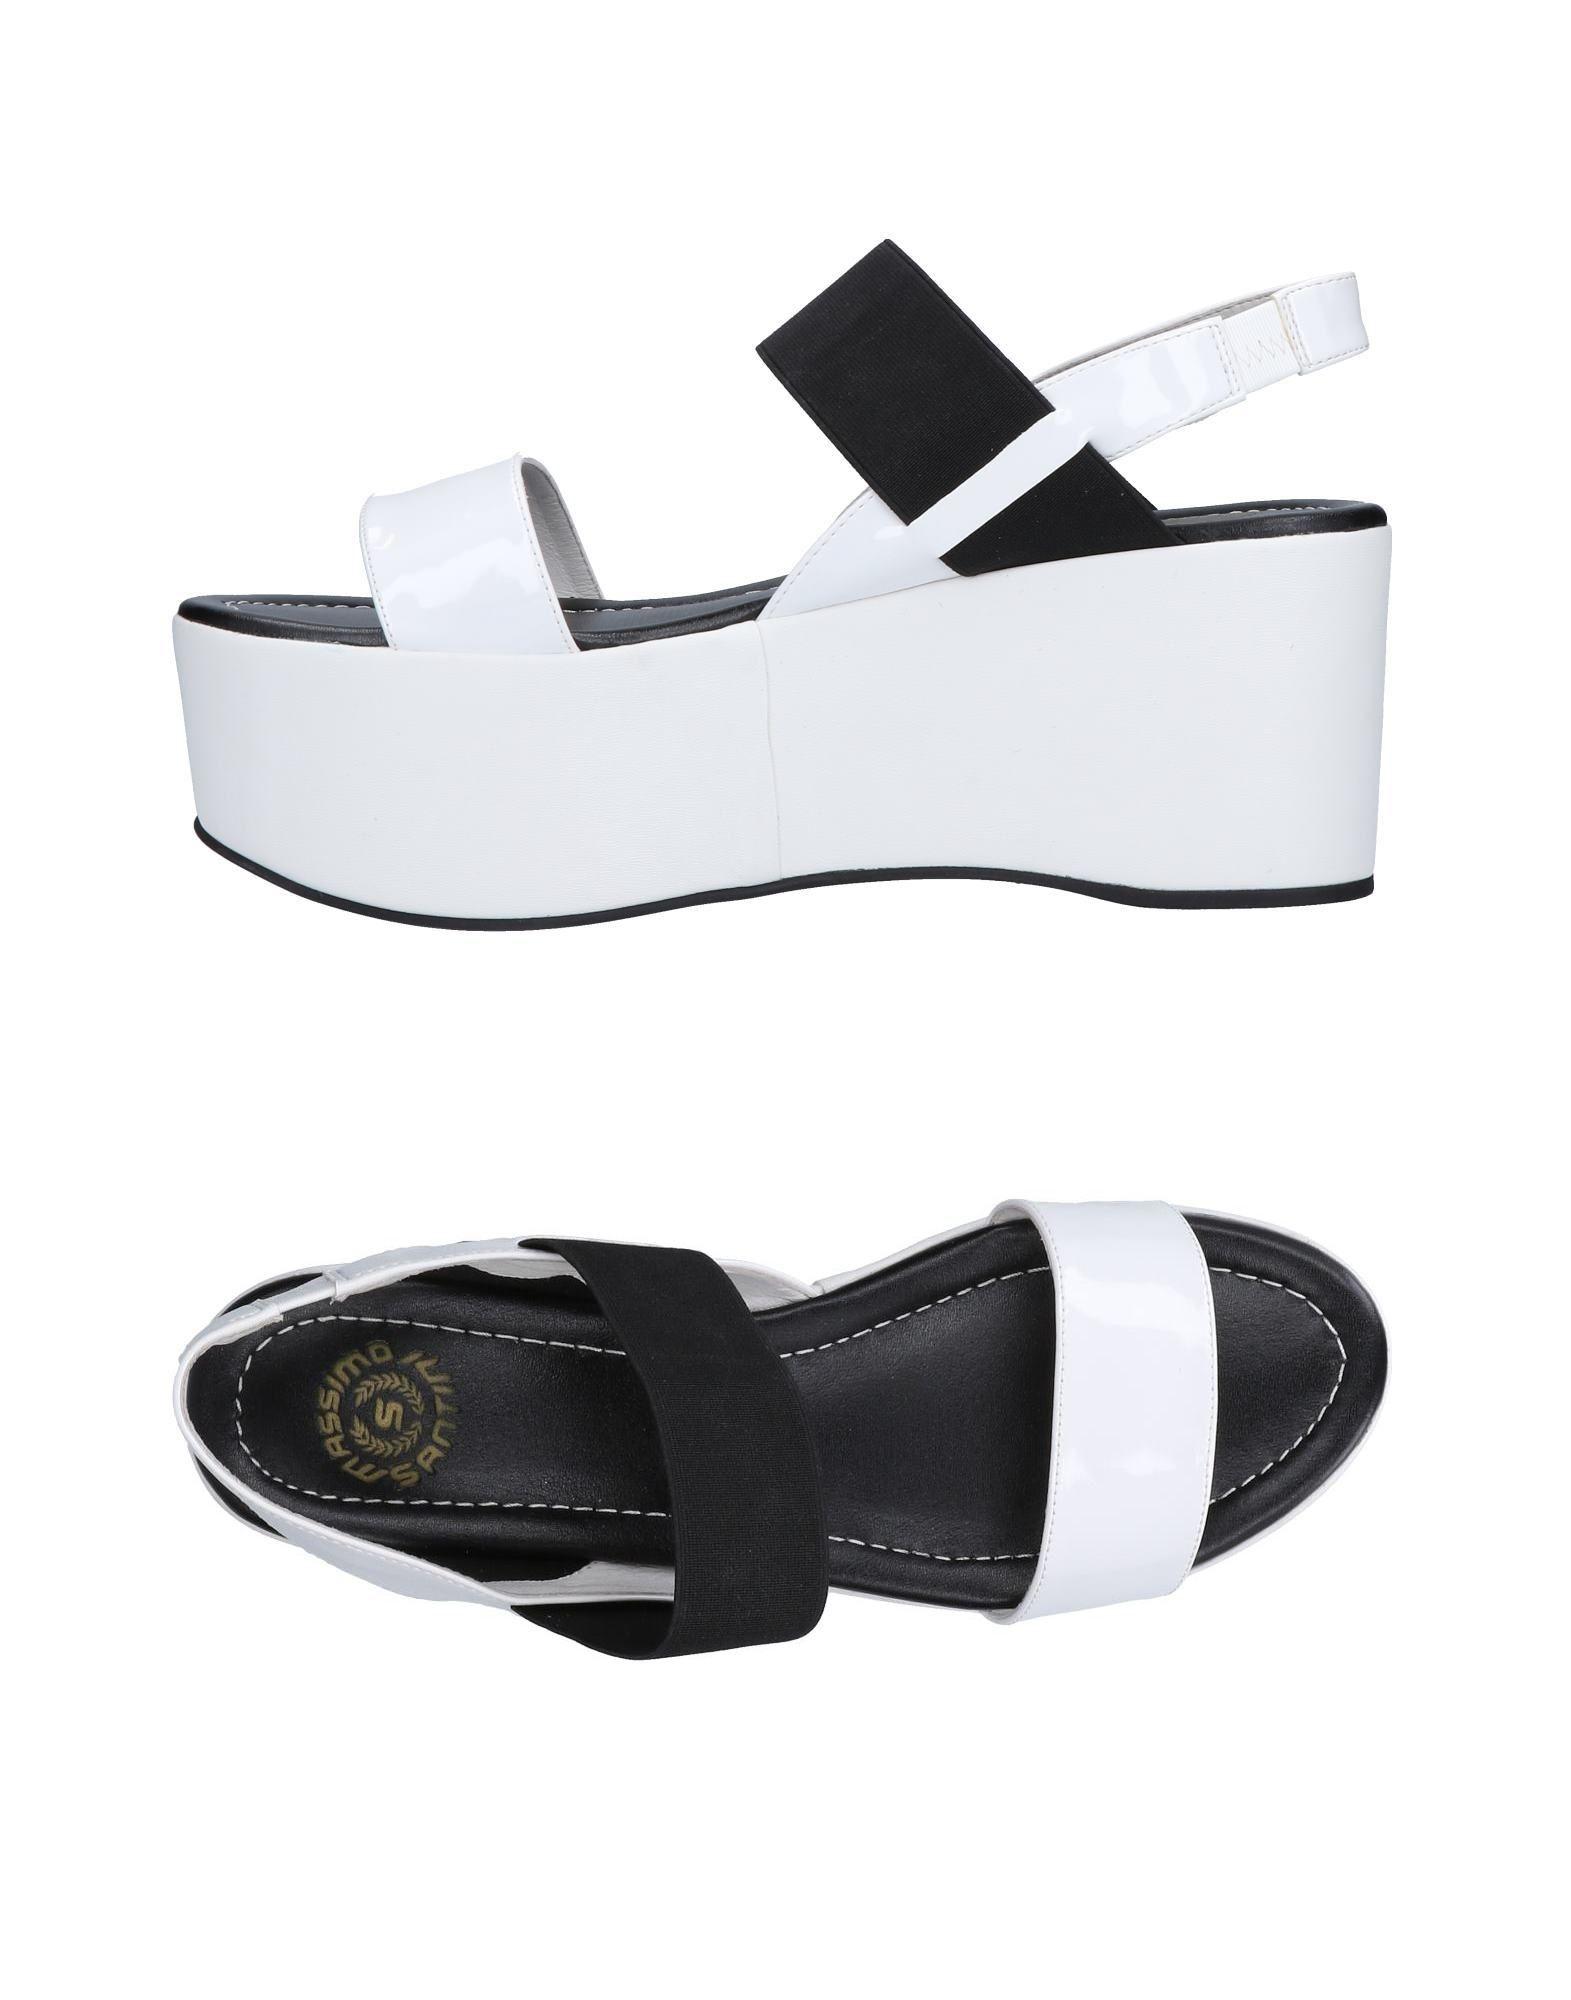 Massimo Santini Gute Sandalen Damen  11502725SQ Gute Santini Qualität beliebte Schuhe 668ba6